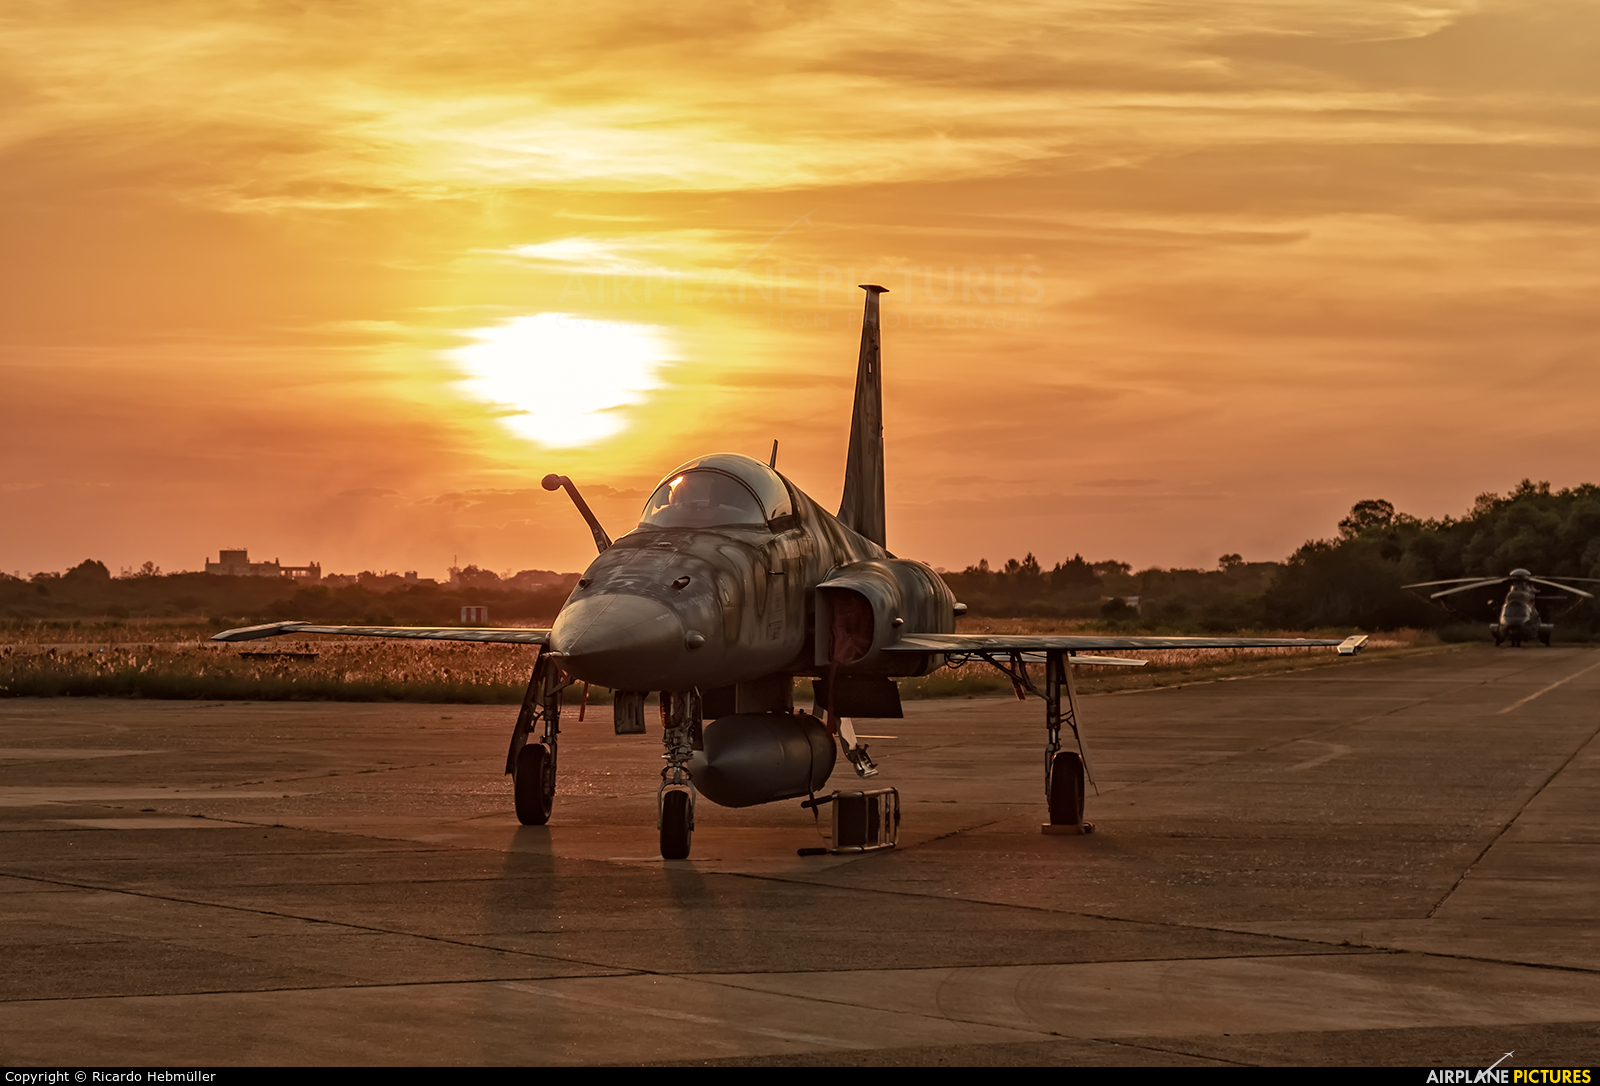 Brazil - Air Force 4870 aircraft at Canoas